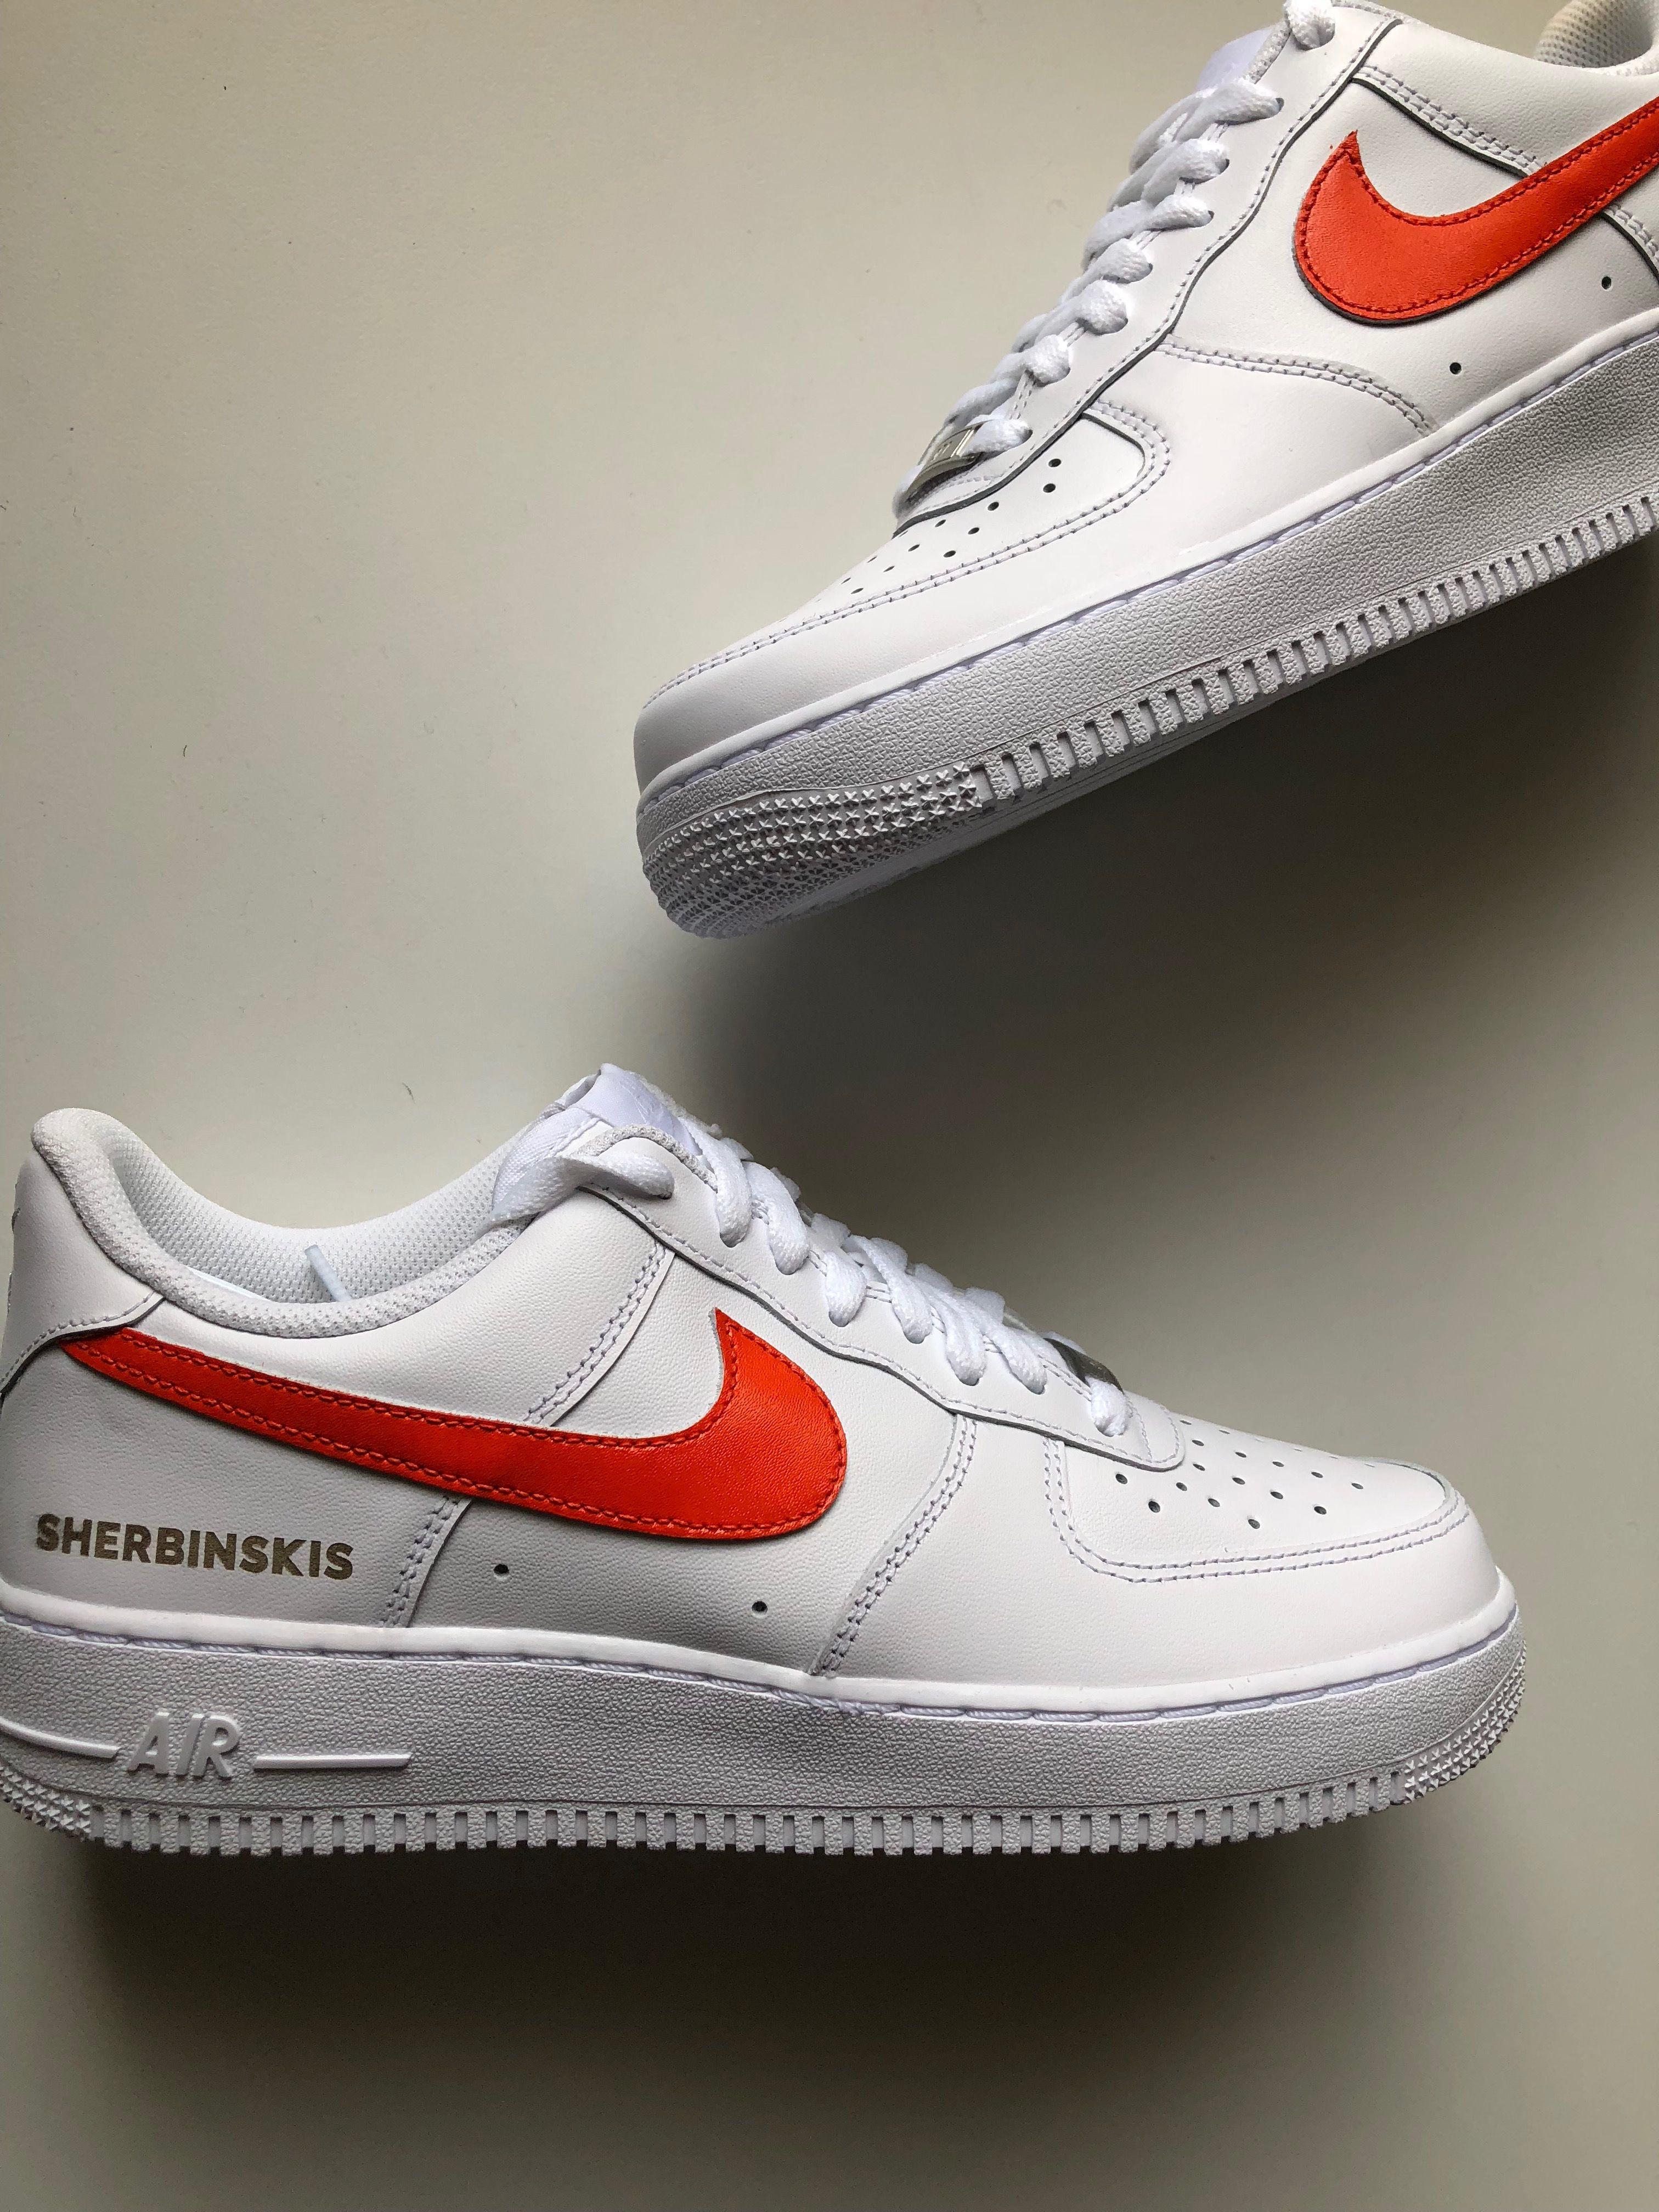 c6cfa41aeb87 SHERBINSKIS x Nike Air Force 1 Bespoke exclusive ComplexCon release –  SHERBINSKIS wordmark.